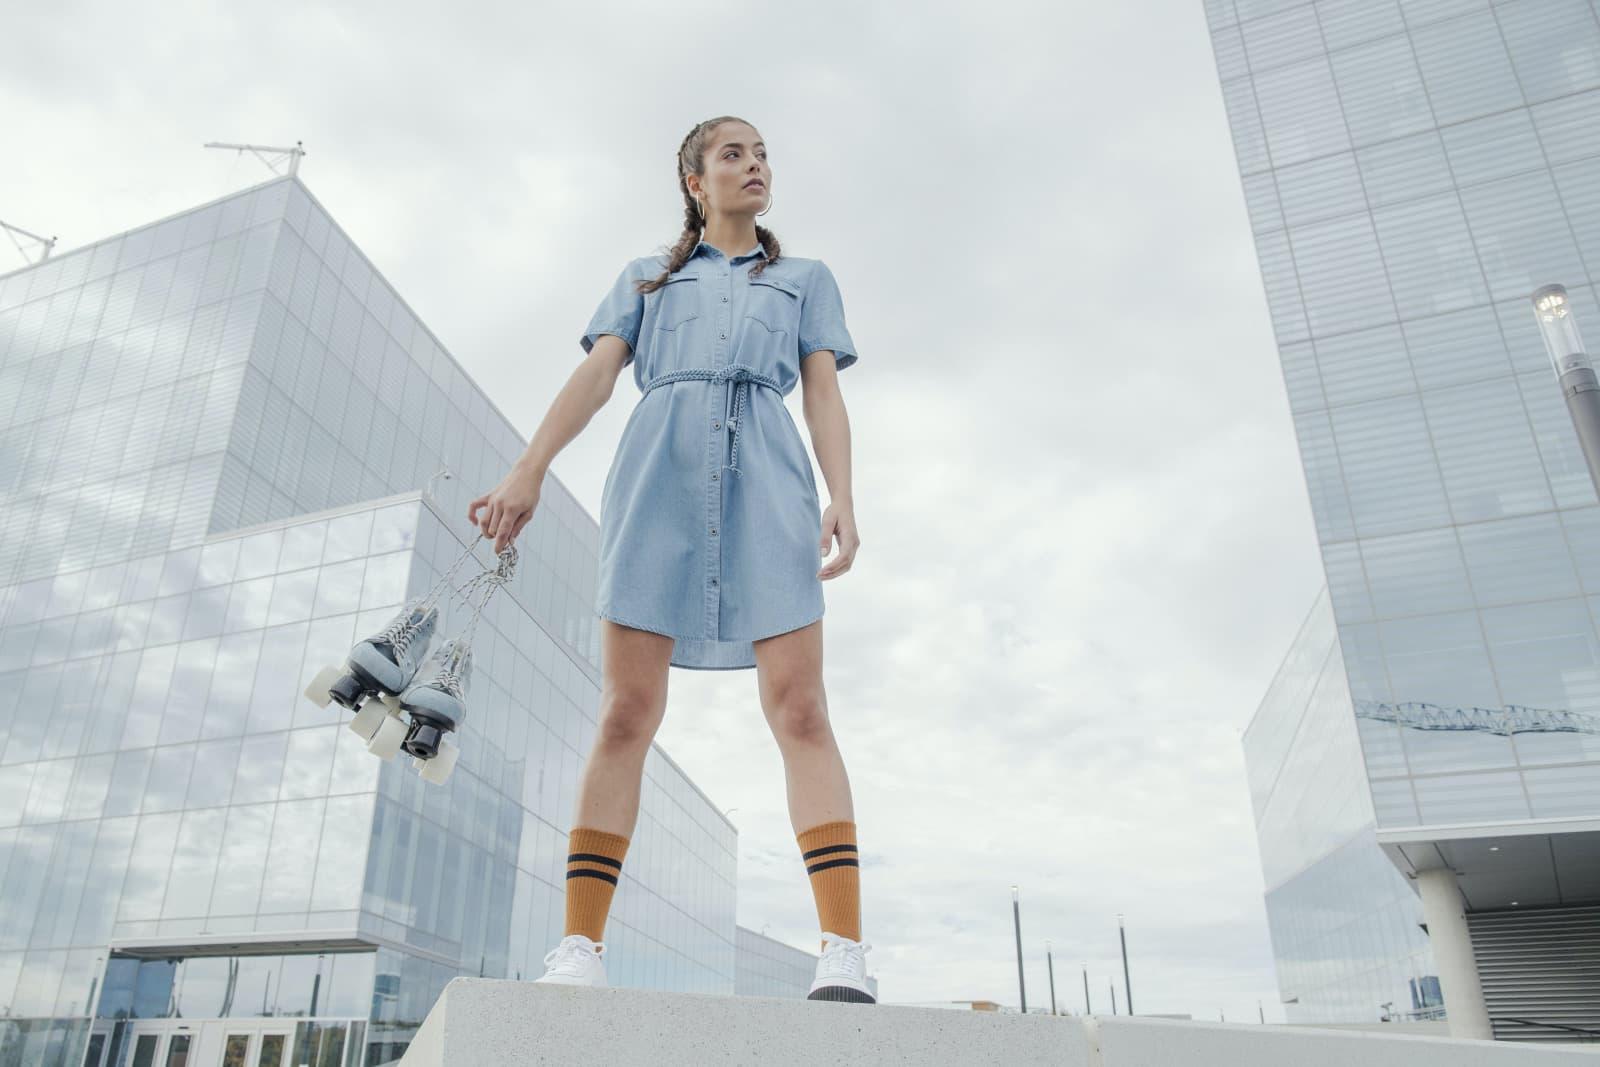 rollerblade studio photo production intersport modeling sport